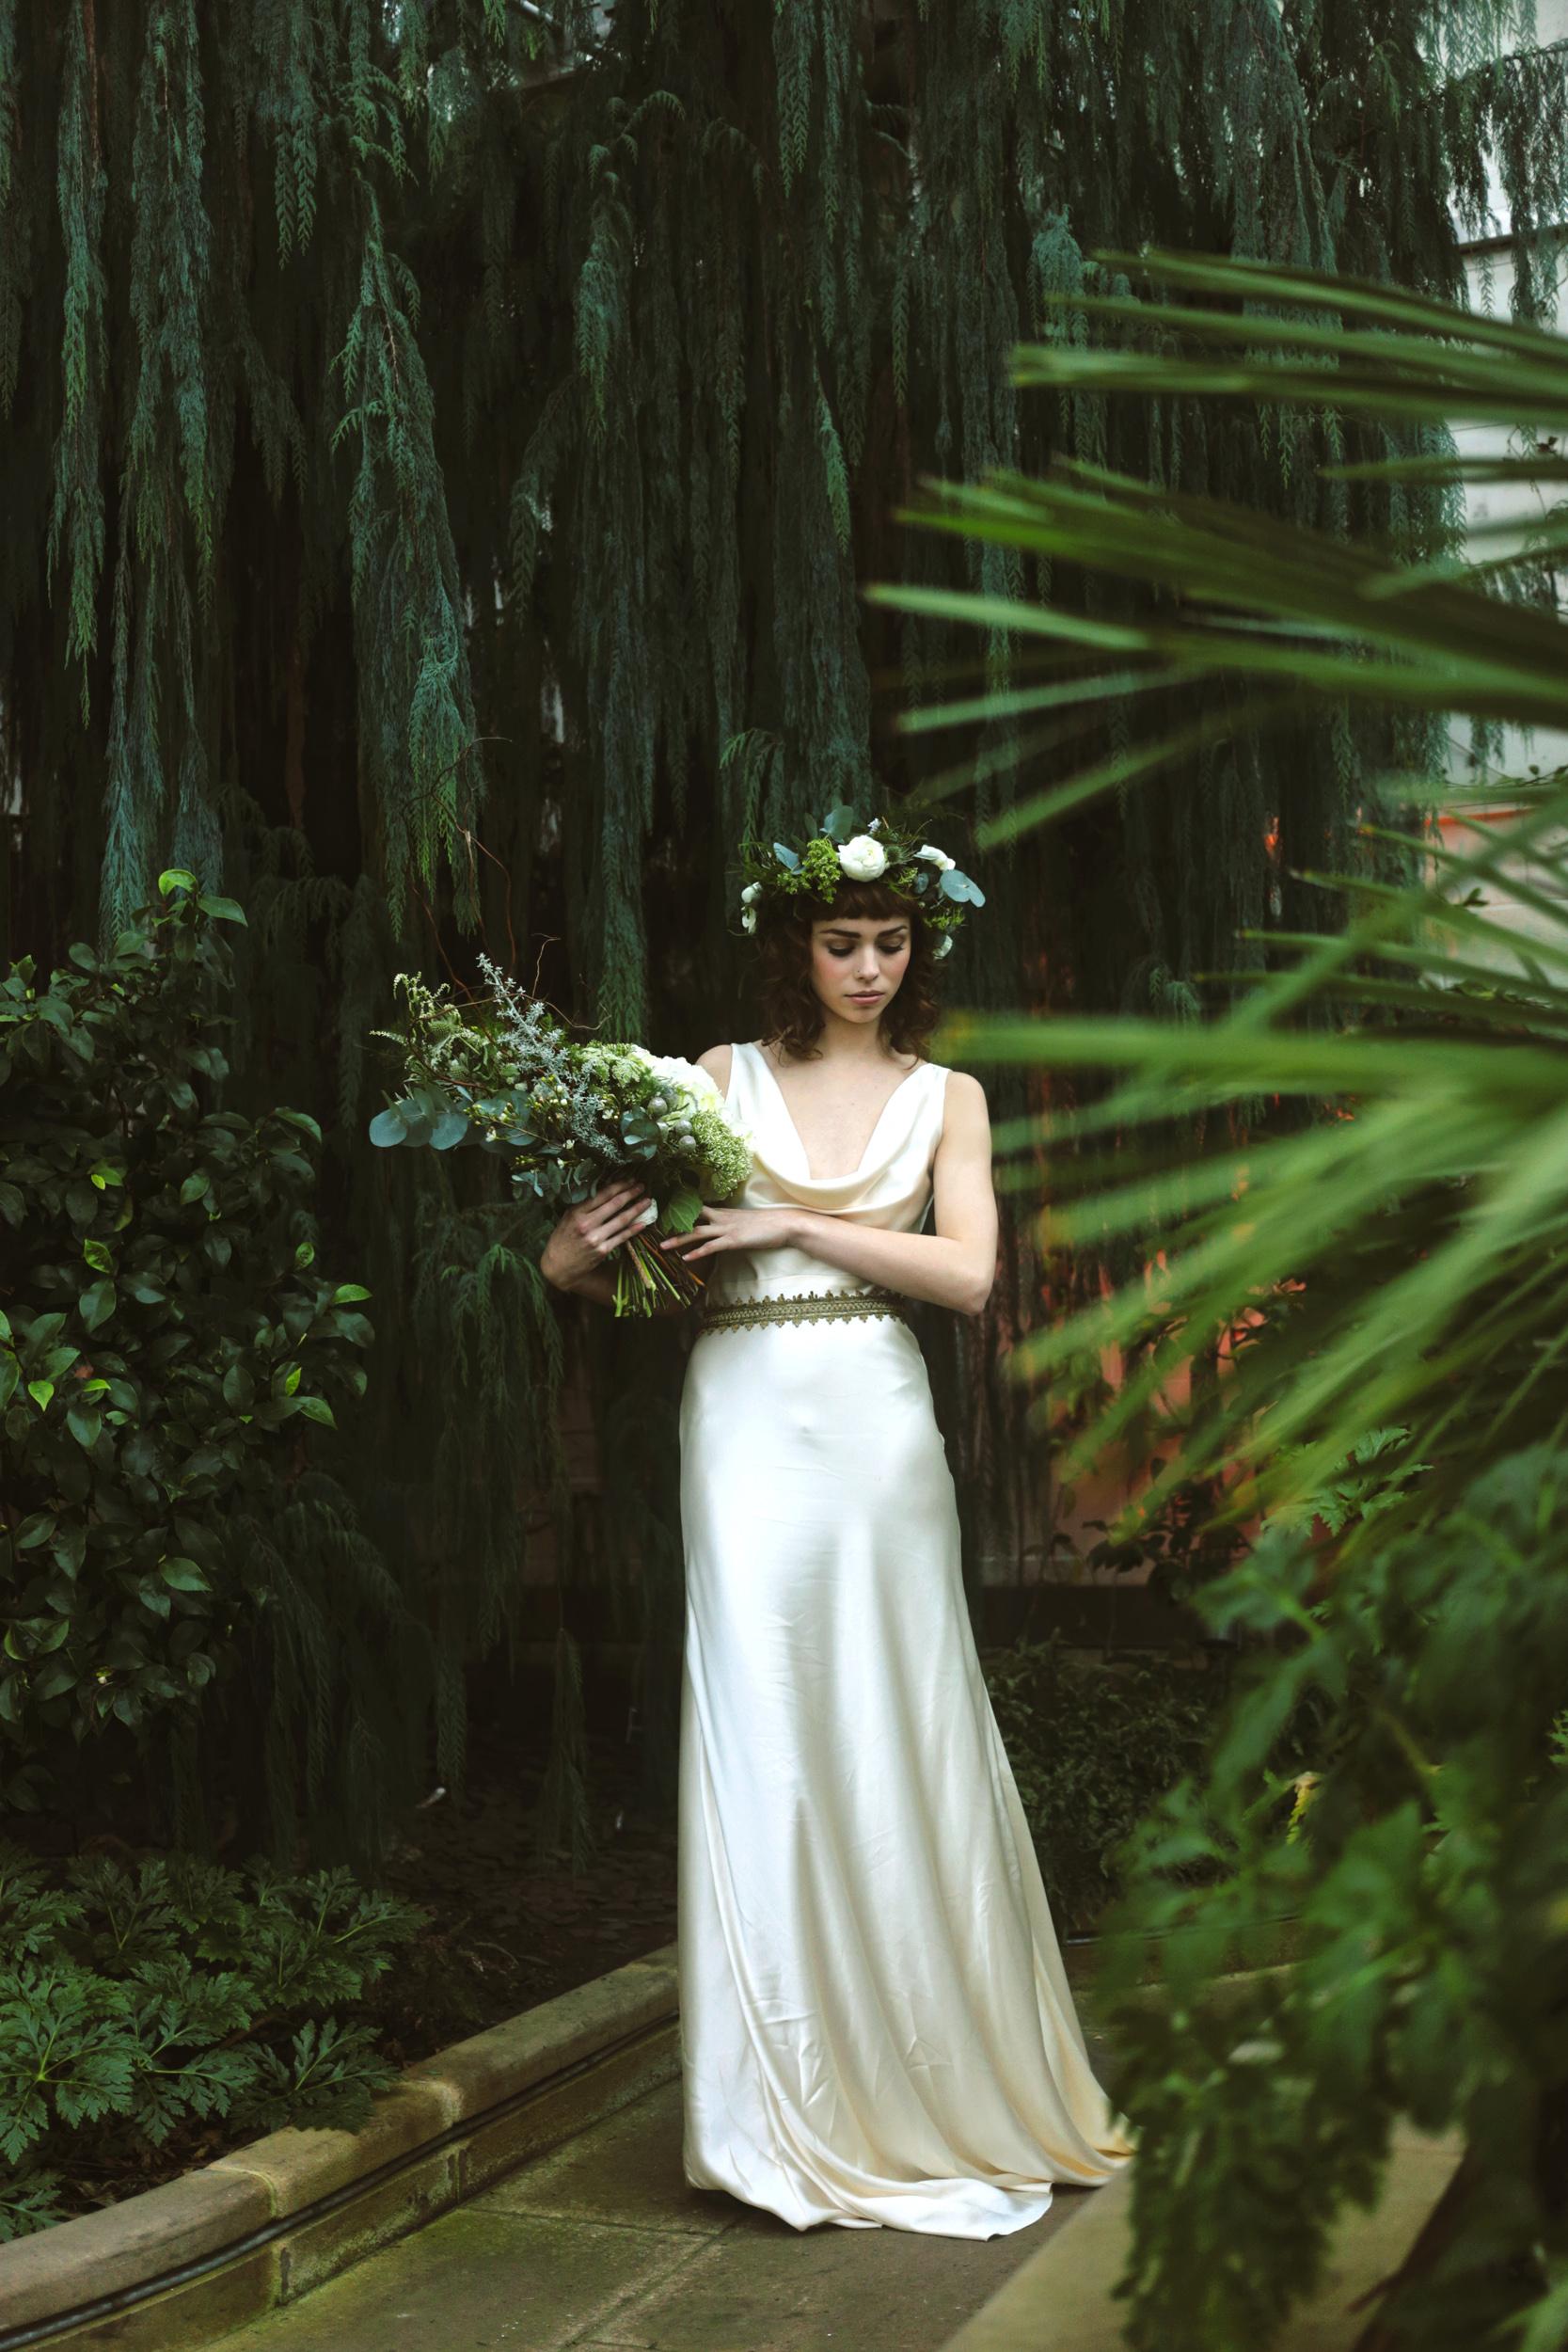 Winter-Bridal-Kate-Beaumont-Shelley-Richmond-Vintage-Wedding-Dress-6.jpg